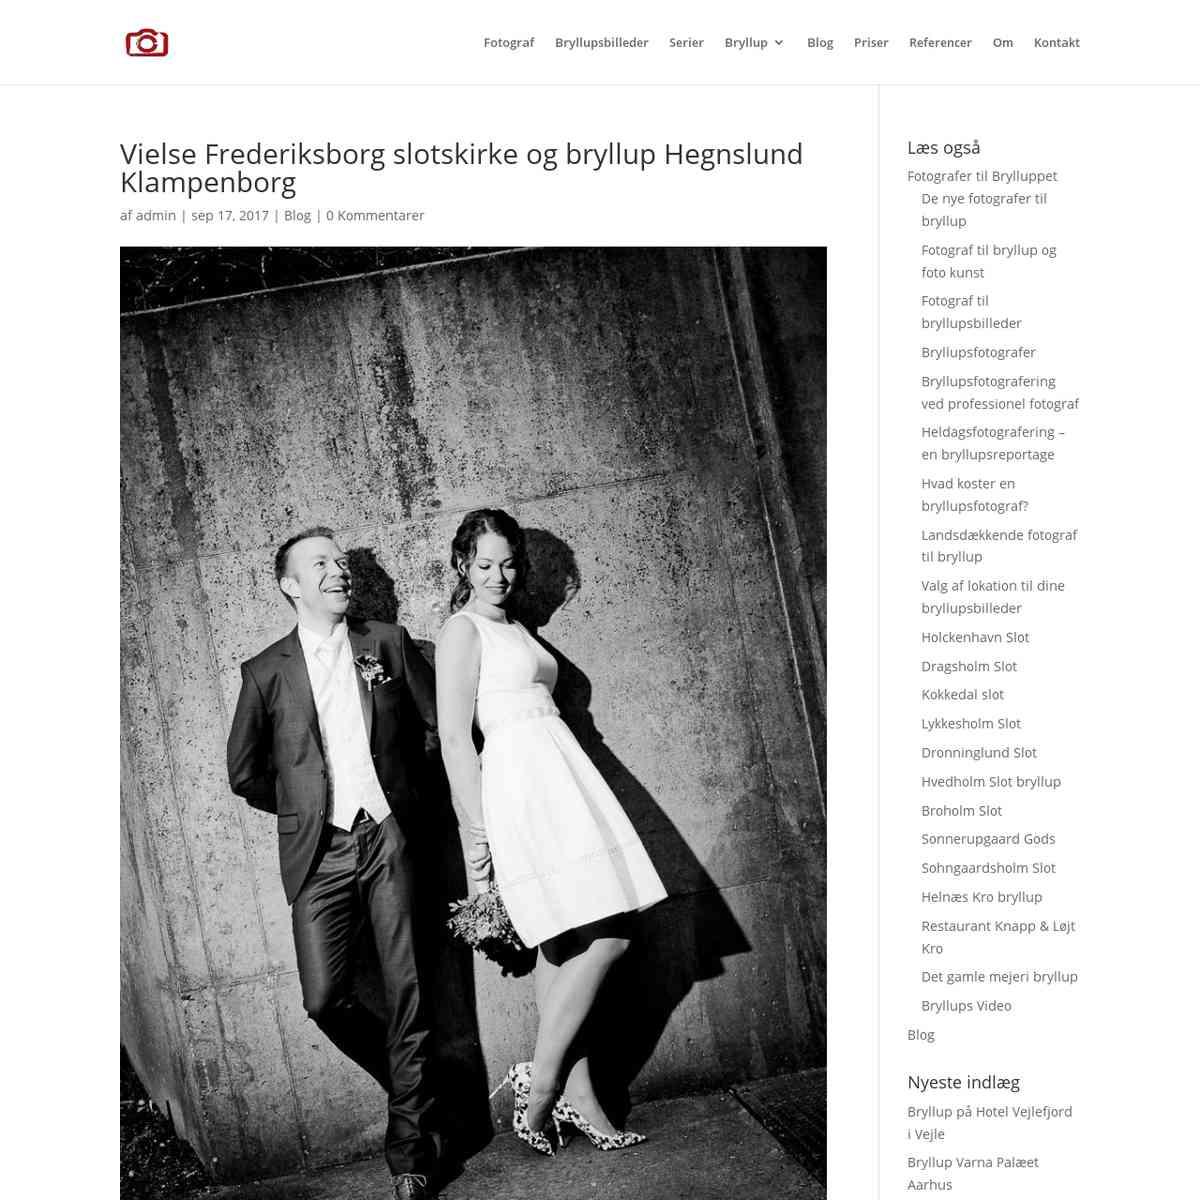 Frederiksborg Slotskirke bryllup